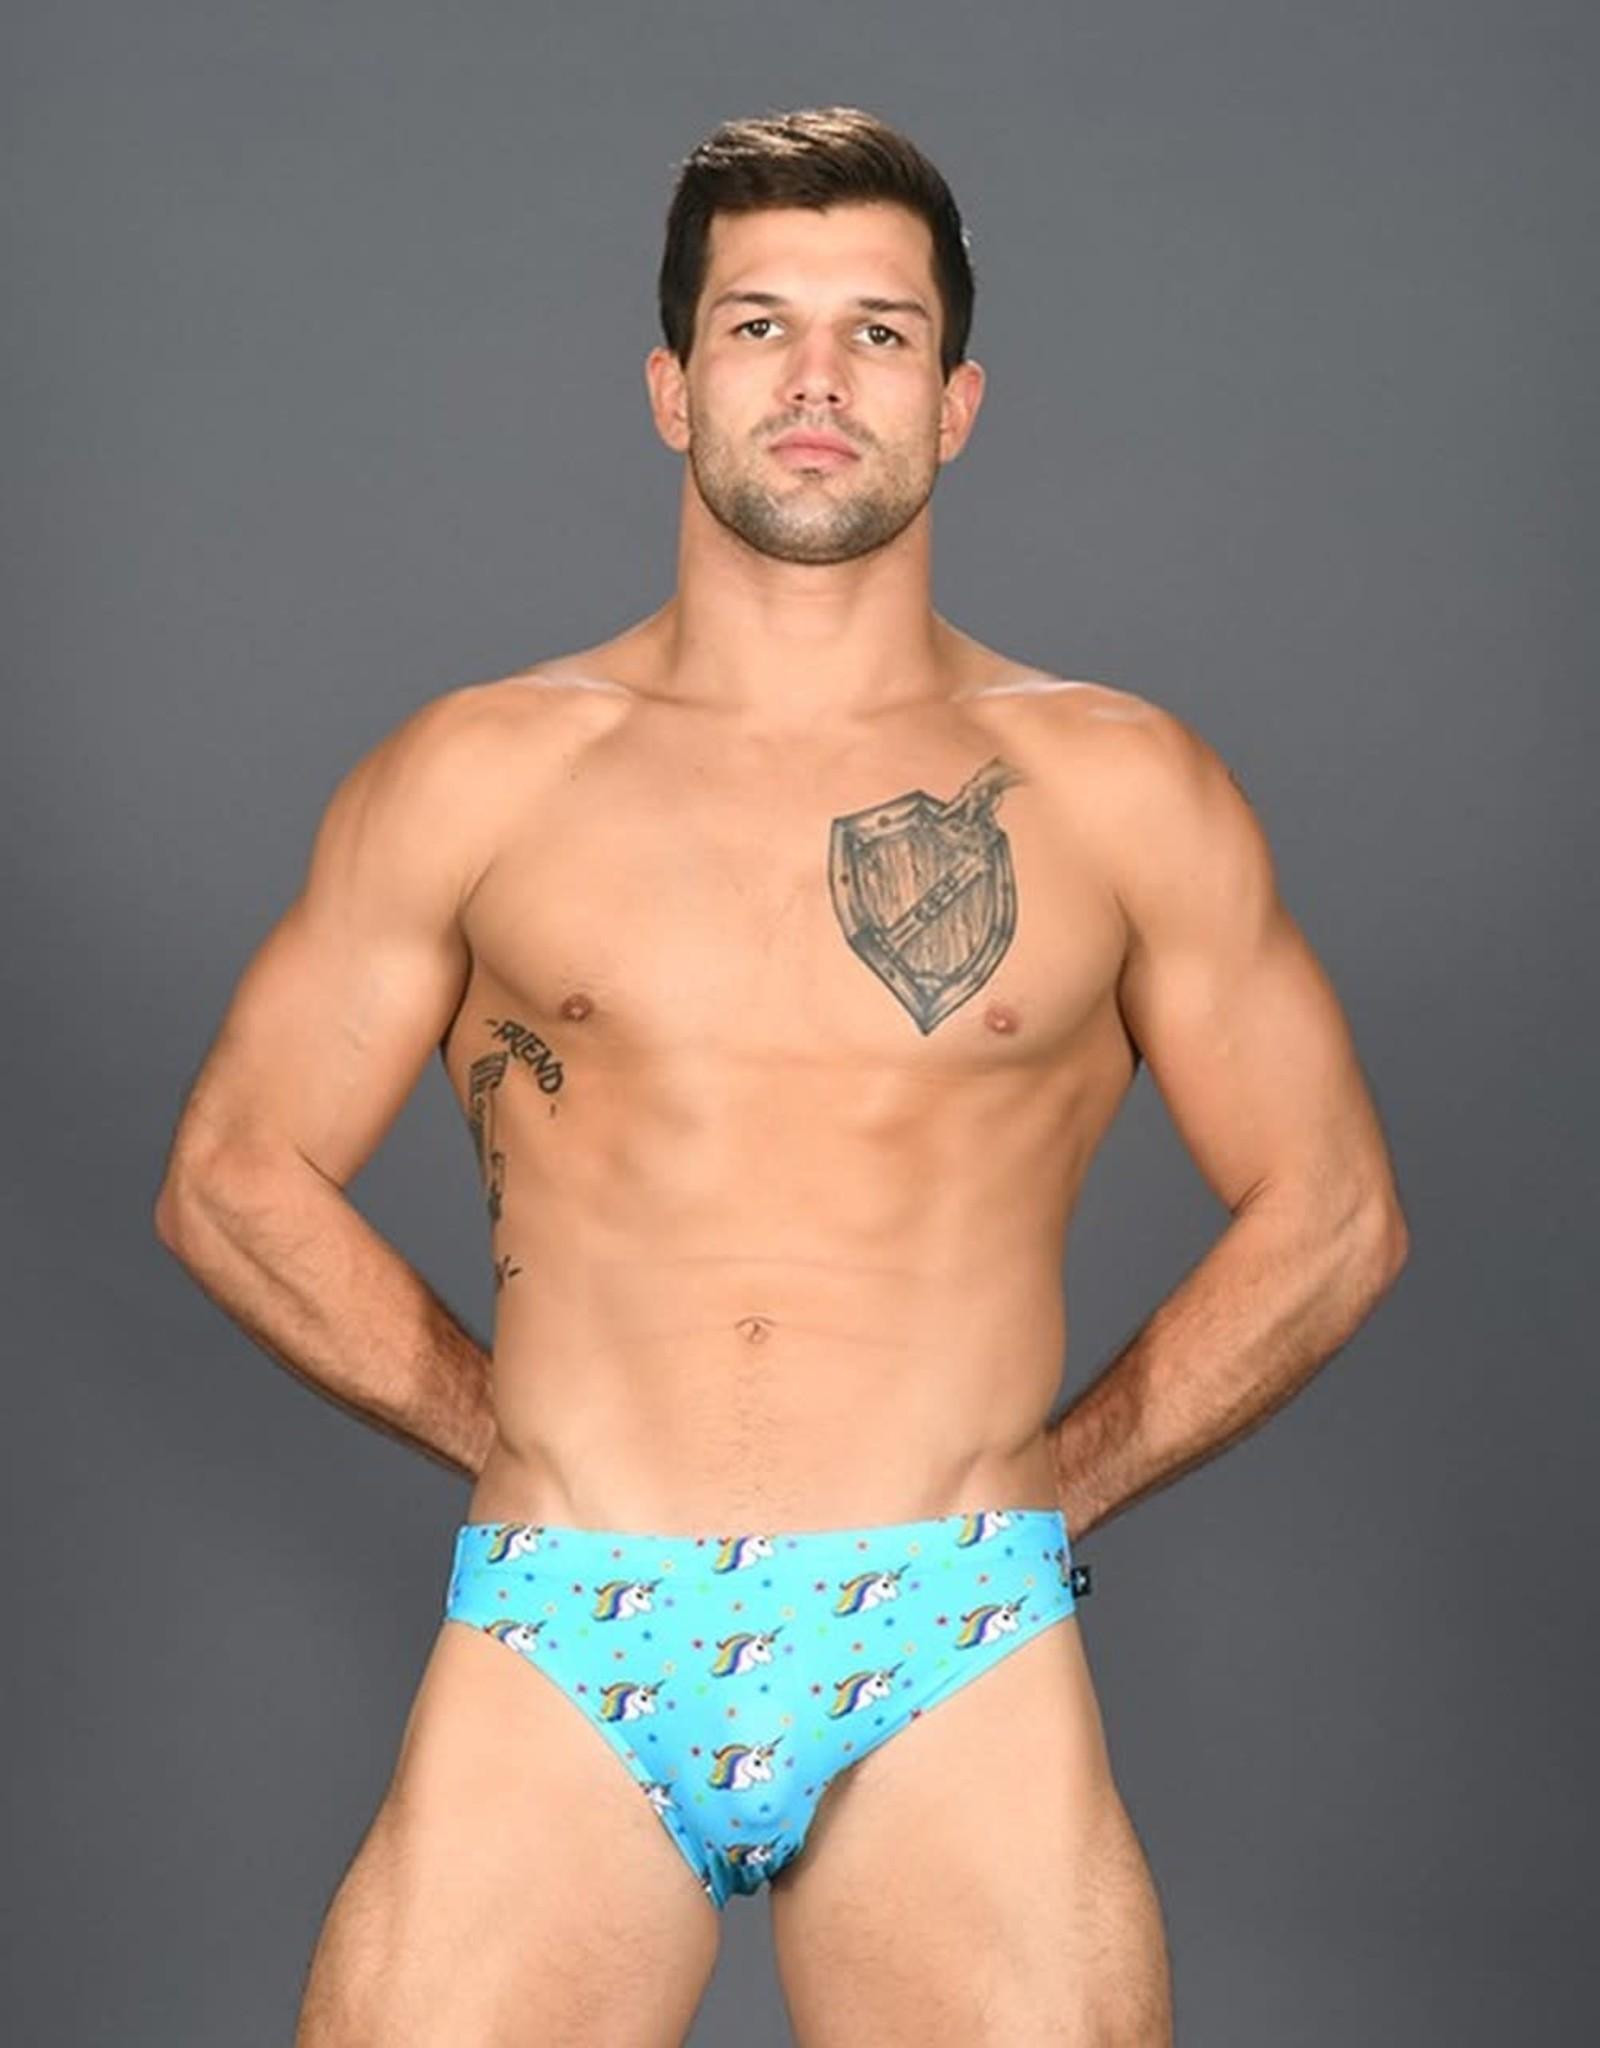 Andrew Christian Rainbow Unicorn Bikini (in store purchase only)